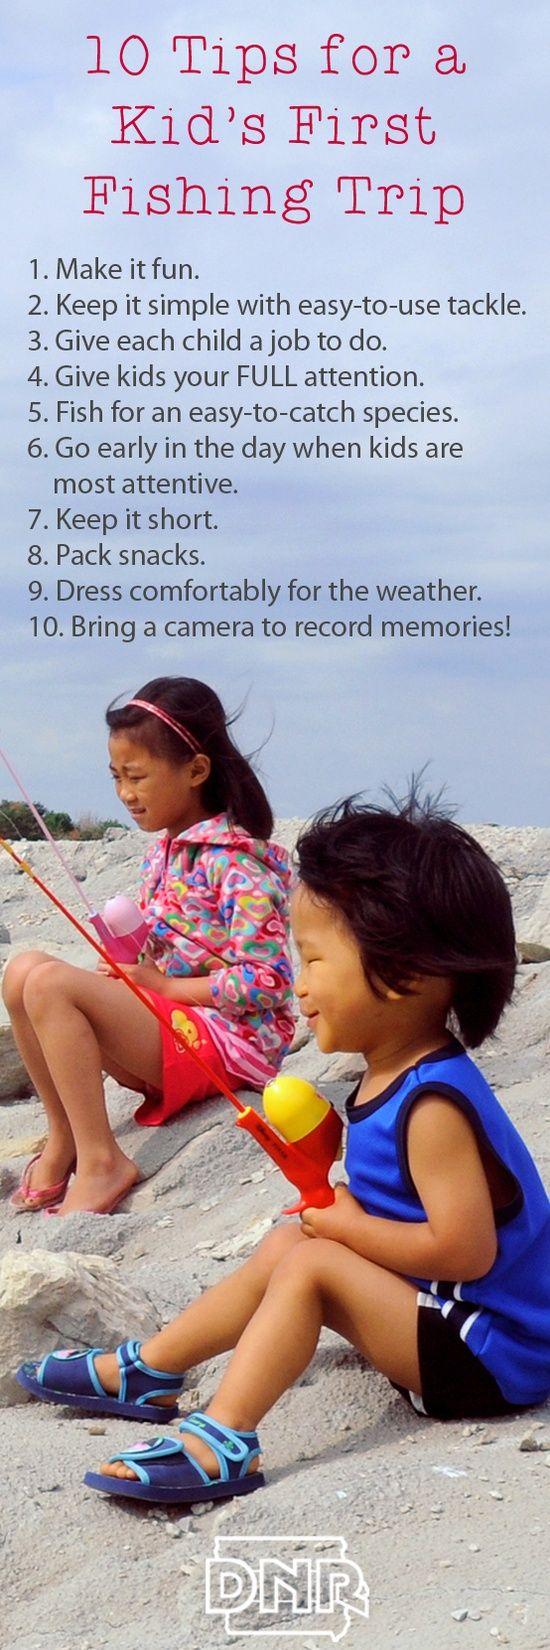 10 tips for taking kids on their first fishing trip! #kids #fishing